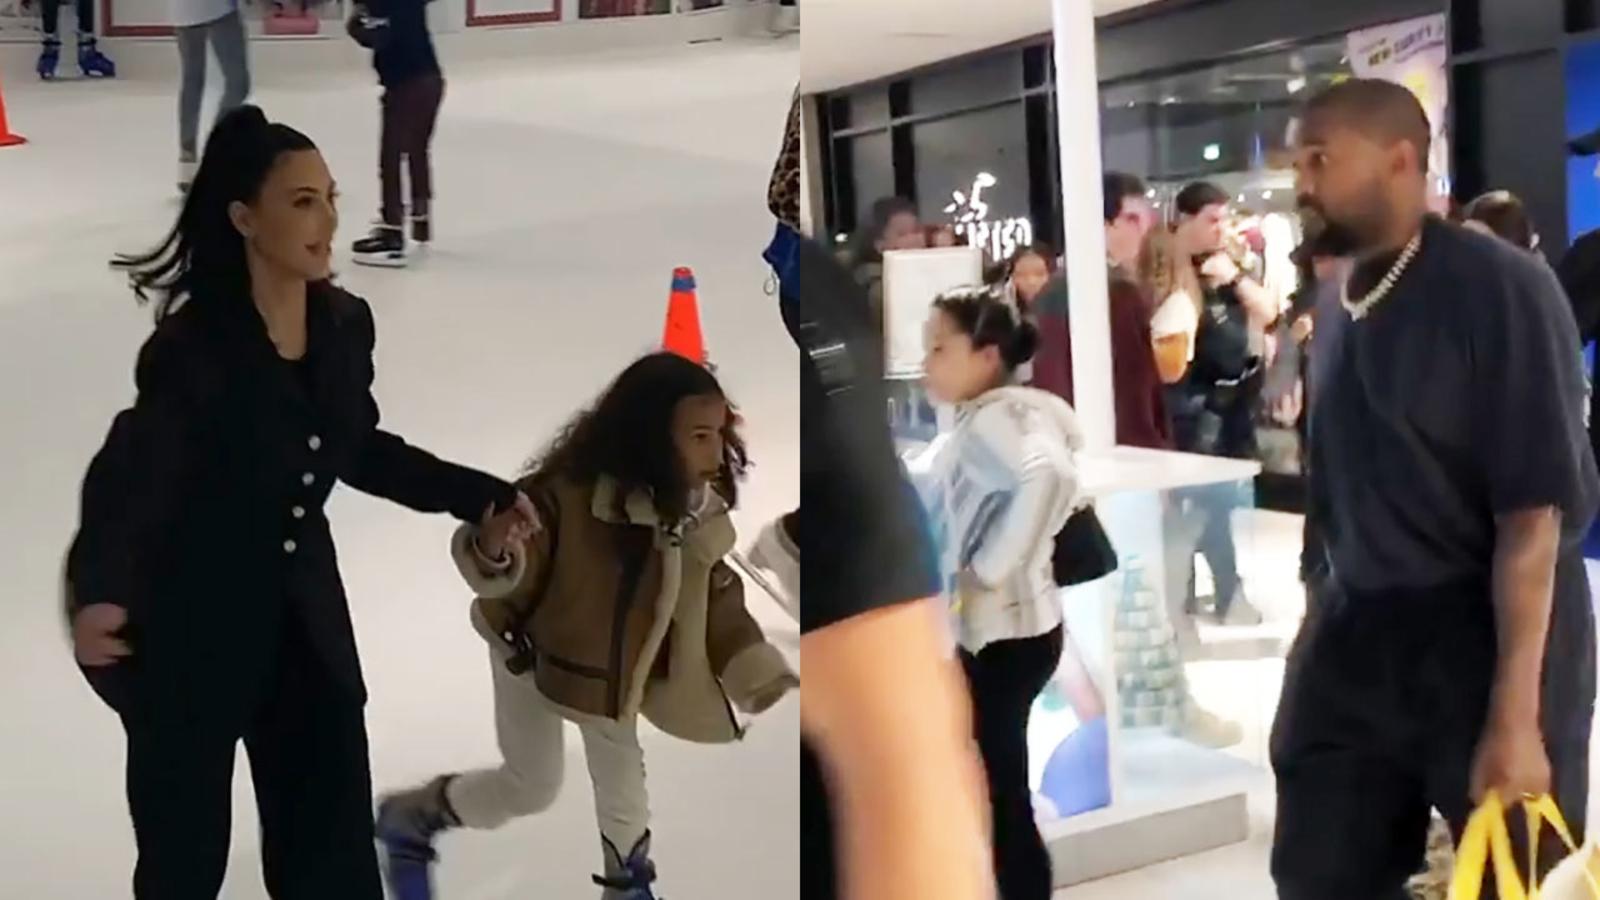 Kanye West shops and Kim Kardashian skates at the Galleria - KTRK-TV